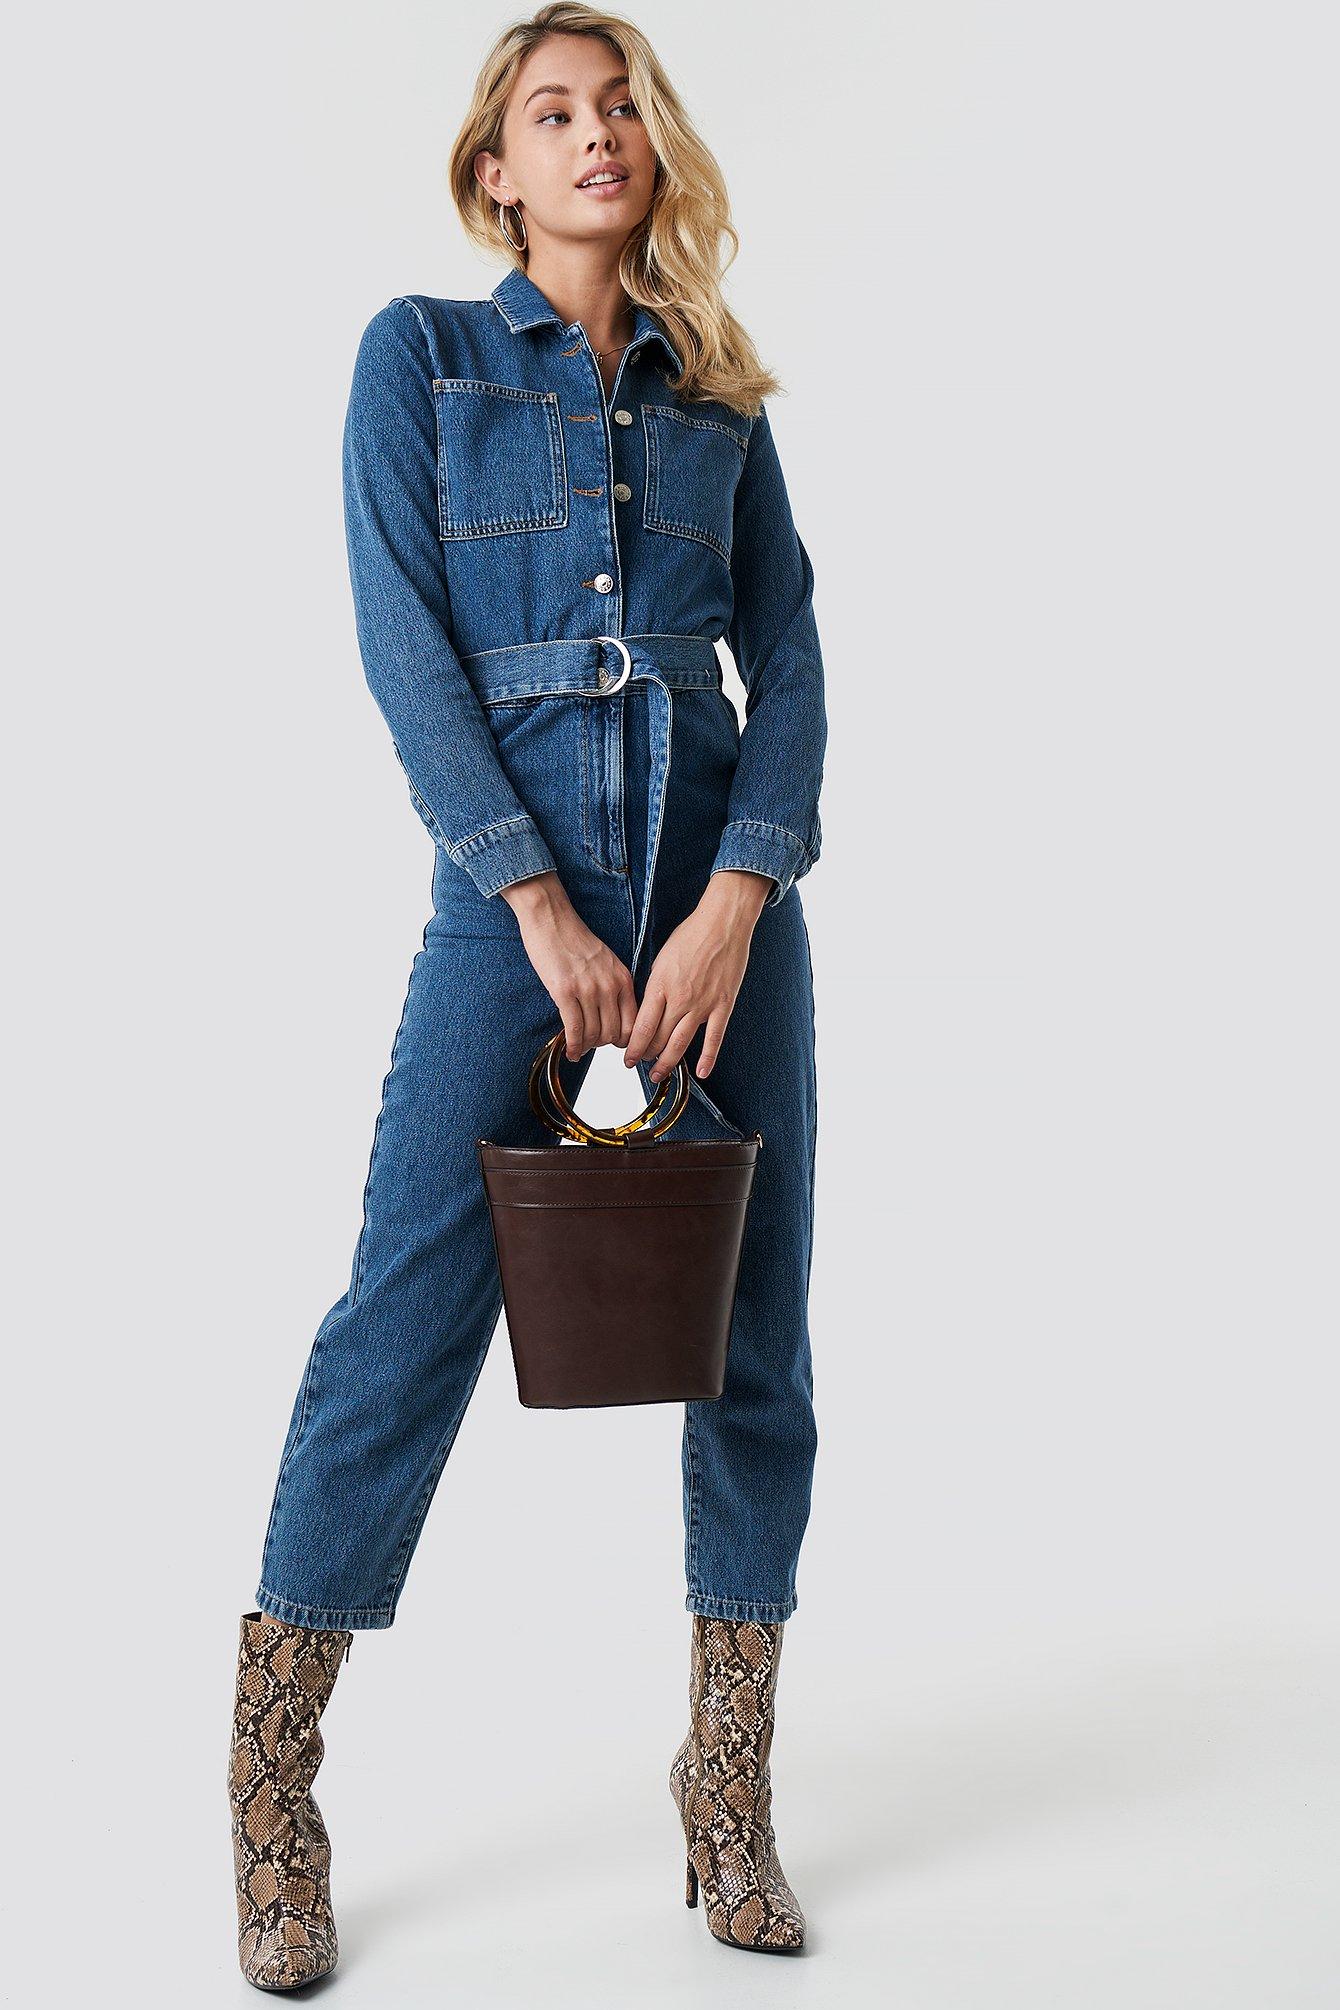 Wonderbaarlijk Waist Belt Denim Jumpsuit Blue | na-kd.com NW-36